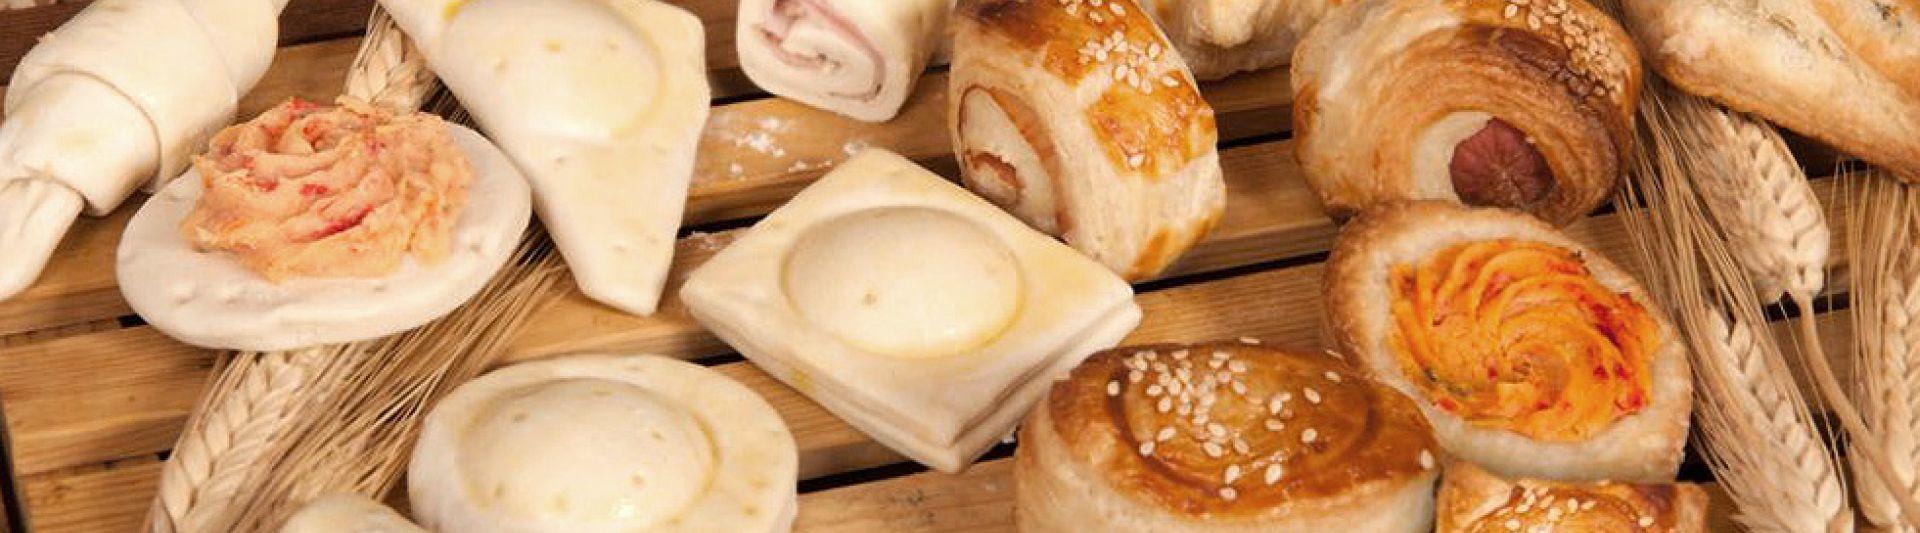 Pasta sfoglia surgelata